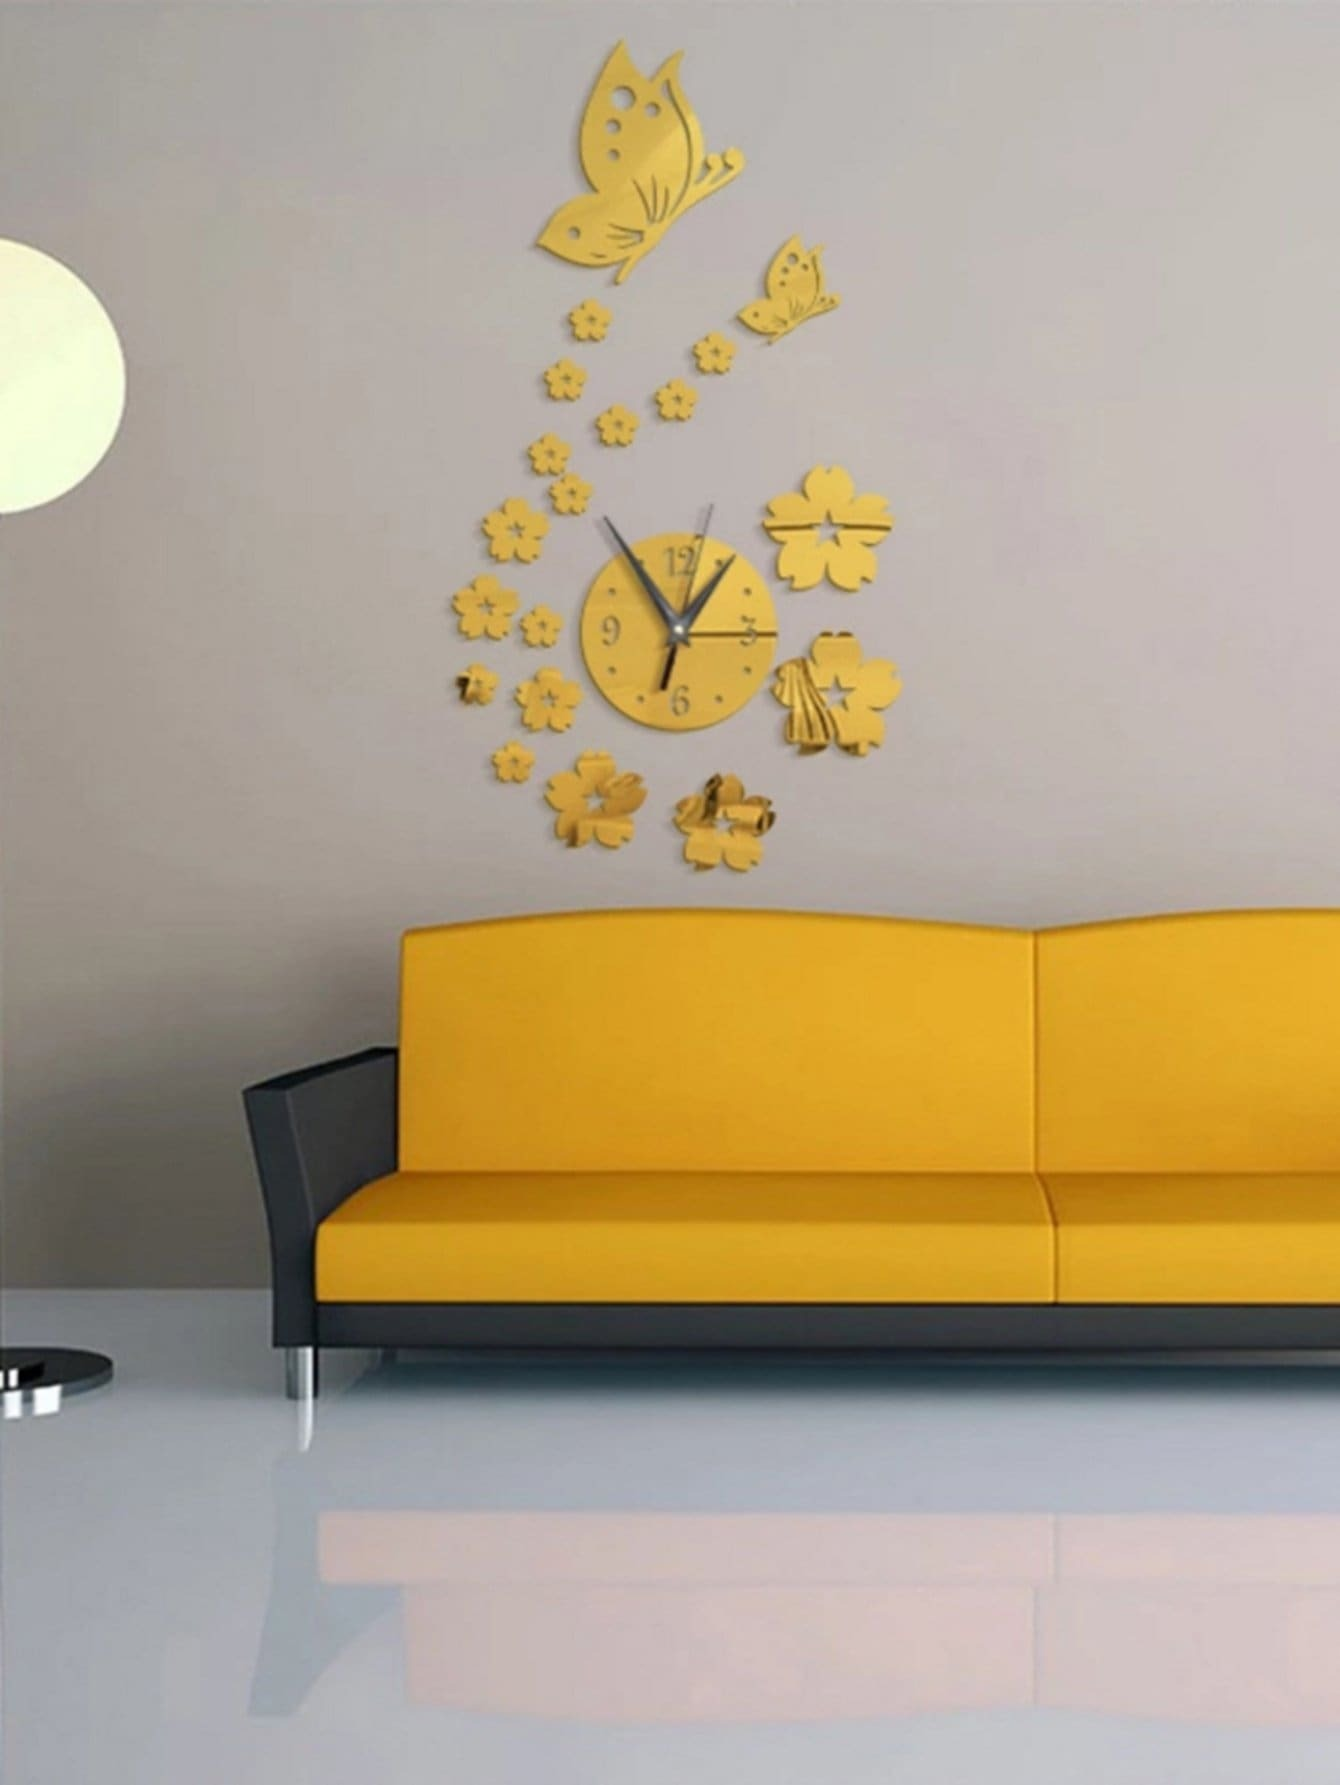 Flower & Clock Mirror Wall Sticker 20pcs все цены